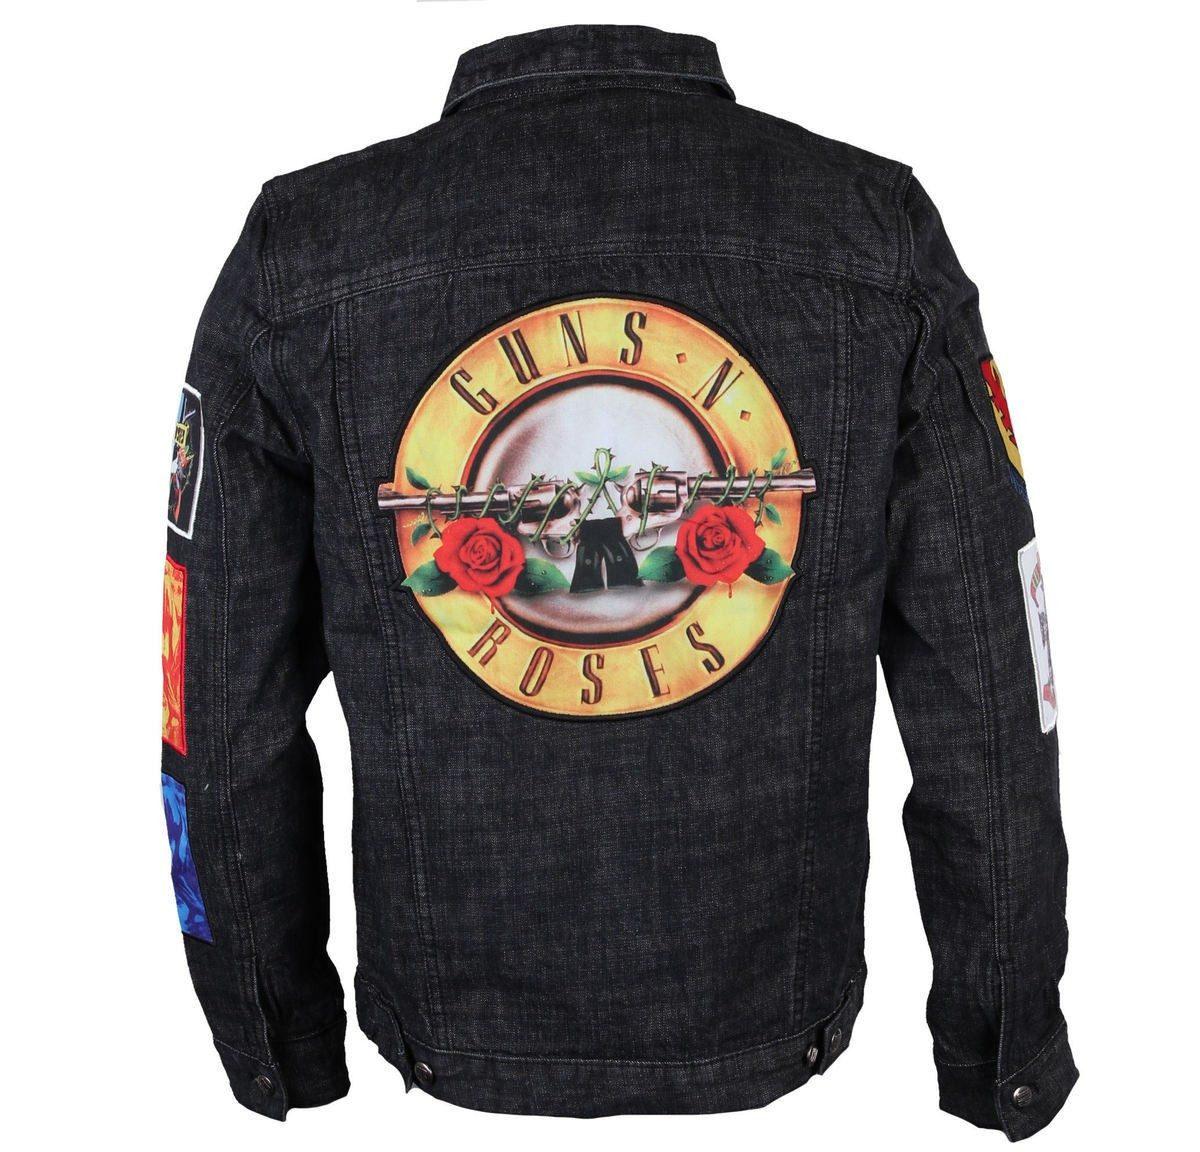 Guns N Roses Denim Jacket Gnr Chamarra Chaqueta Playera